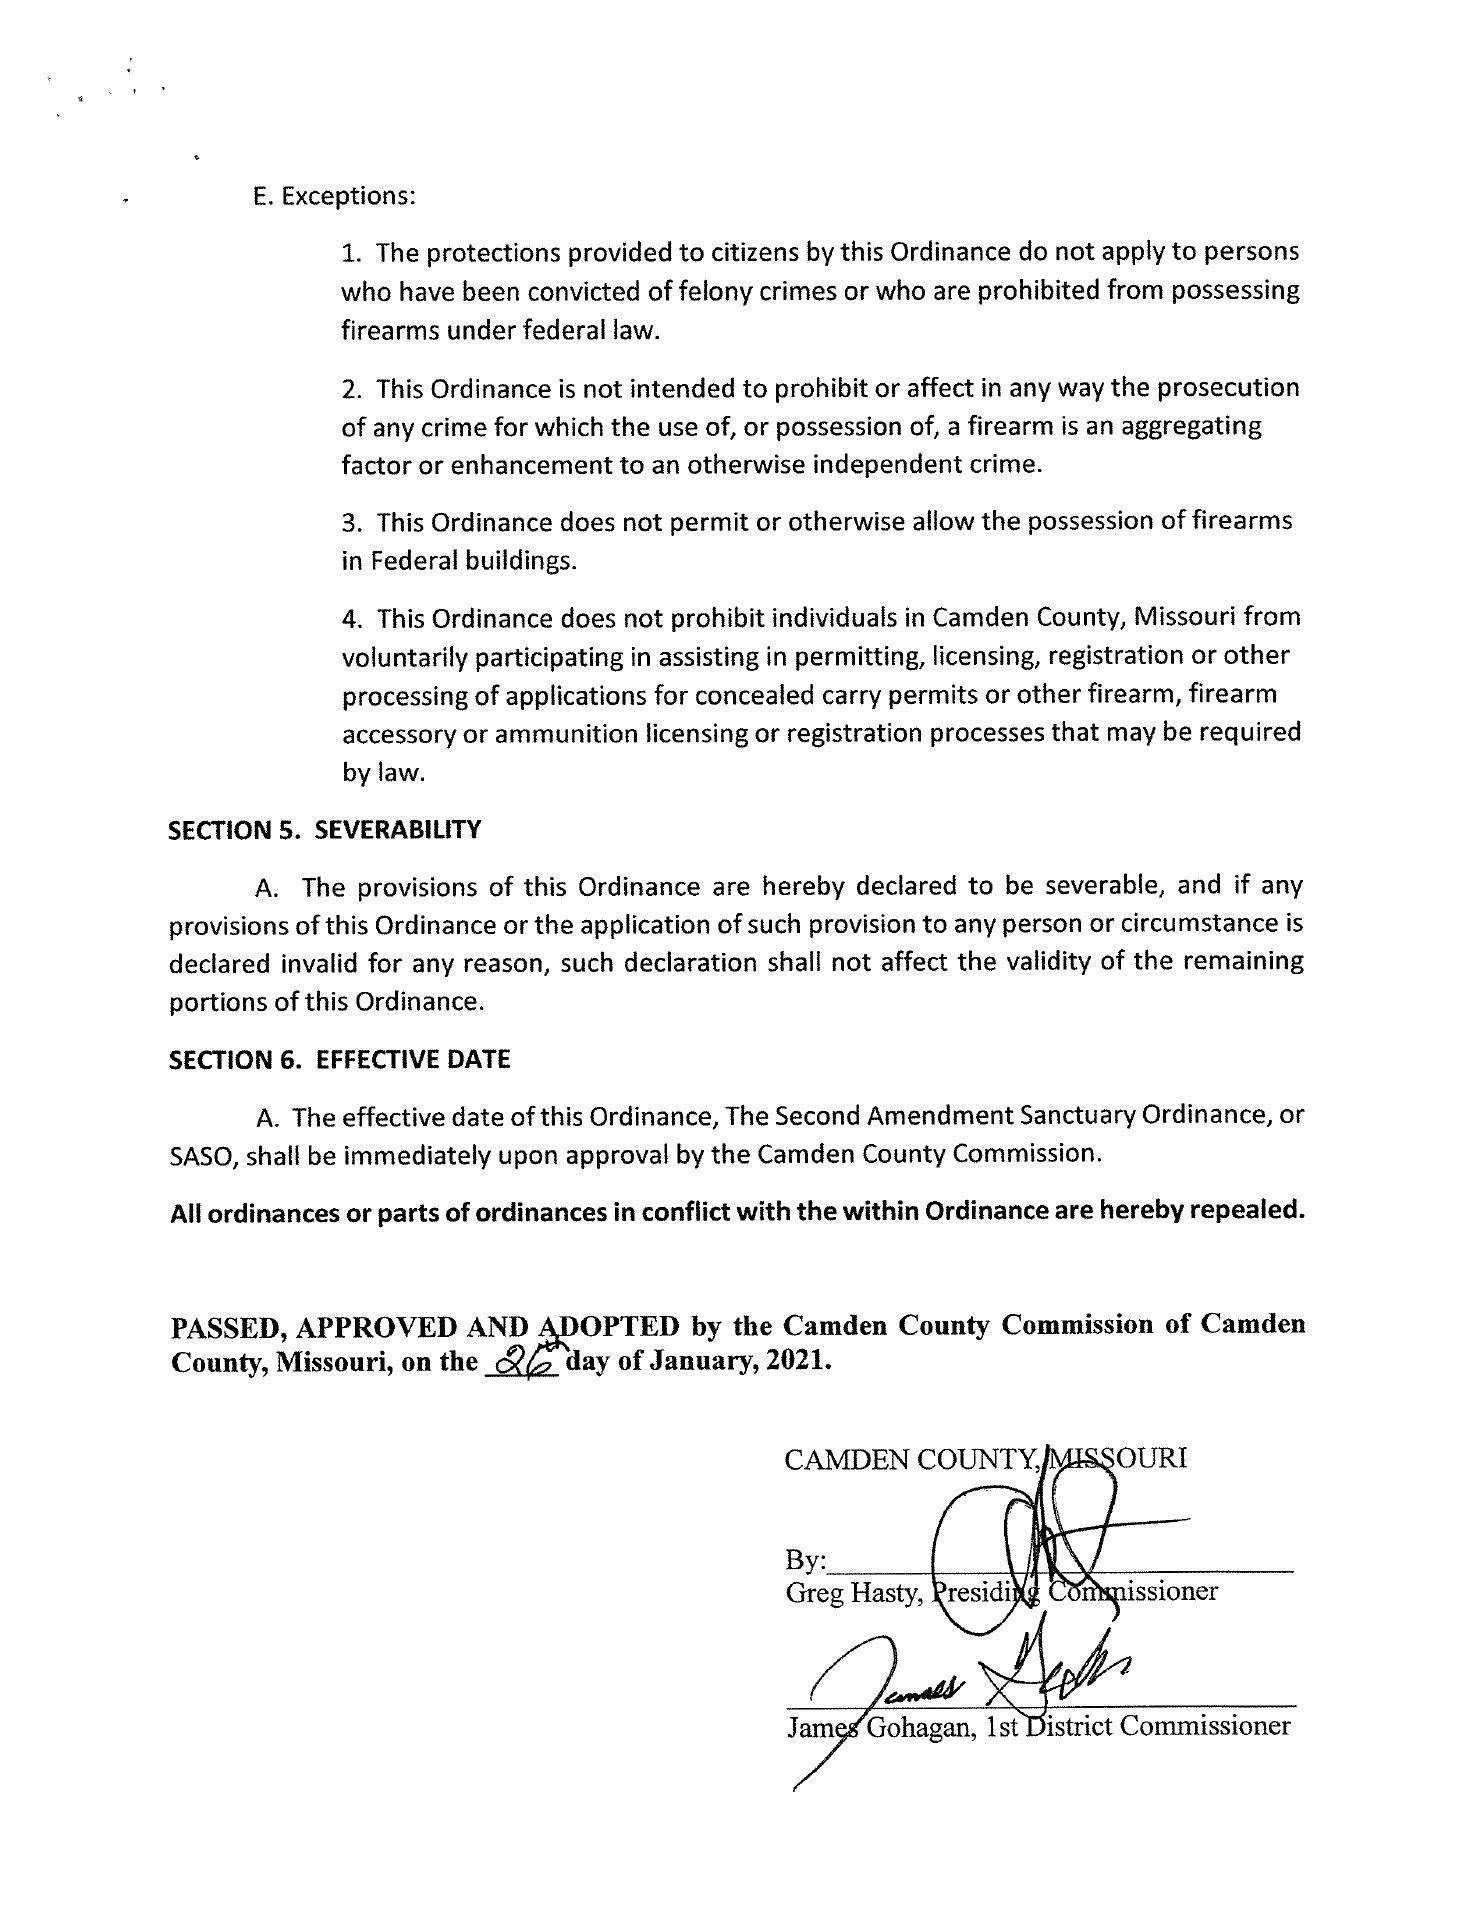 Camden County Second Amendment Sanctuary Ordinance pg-4